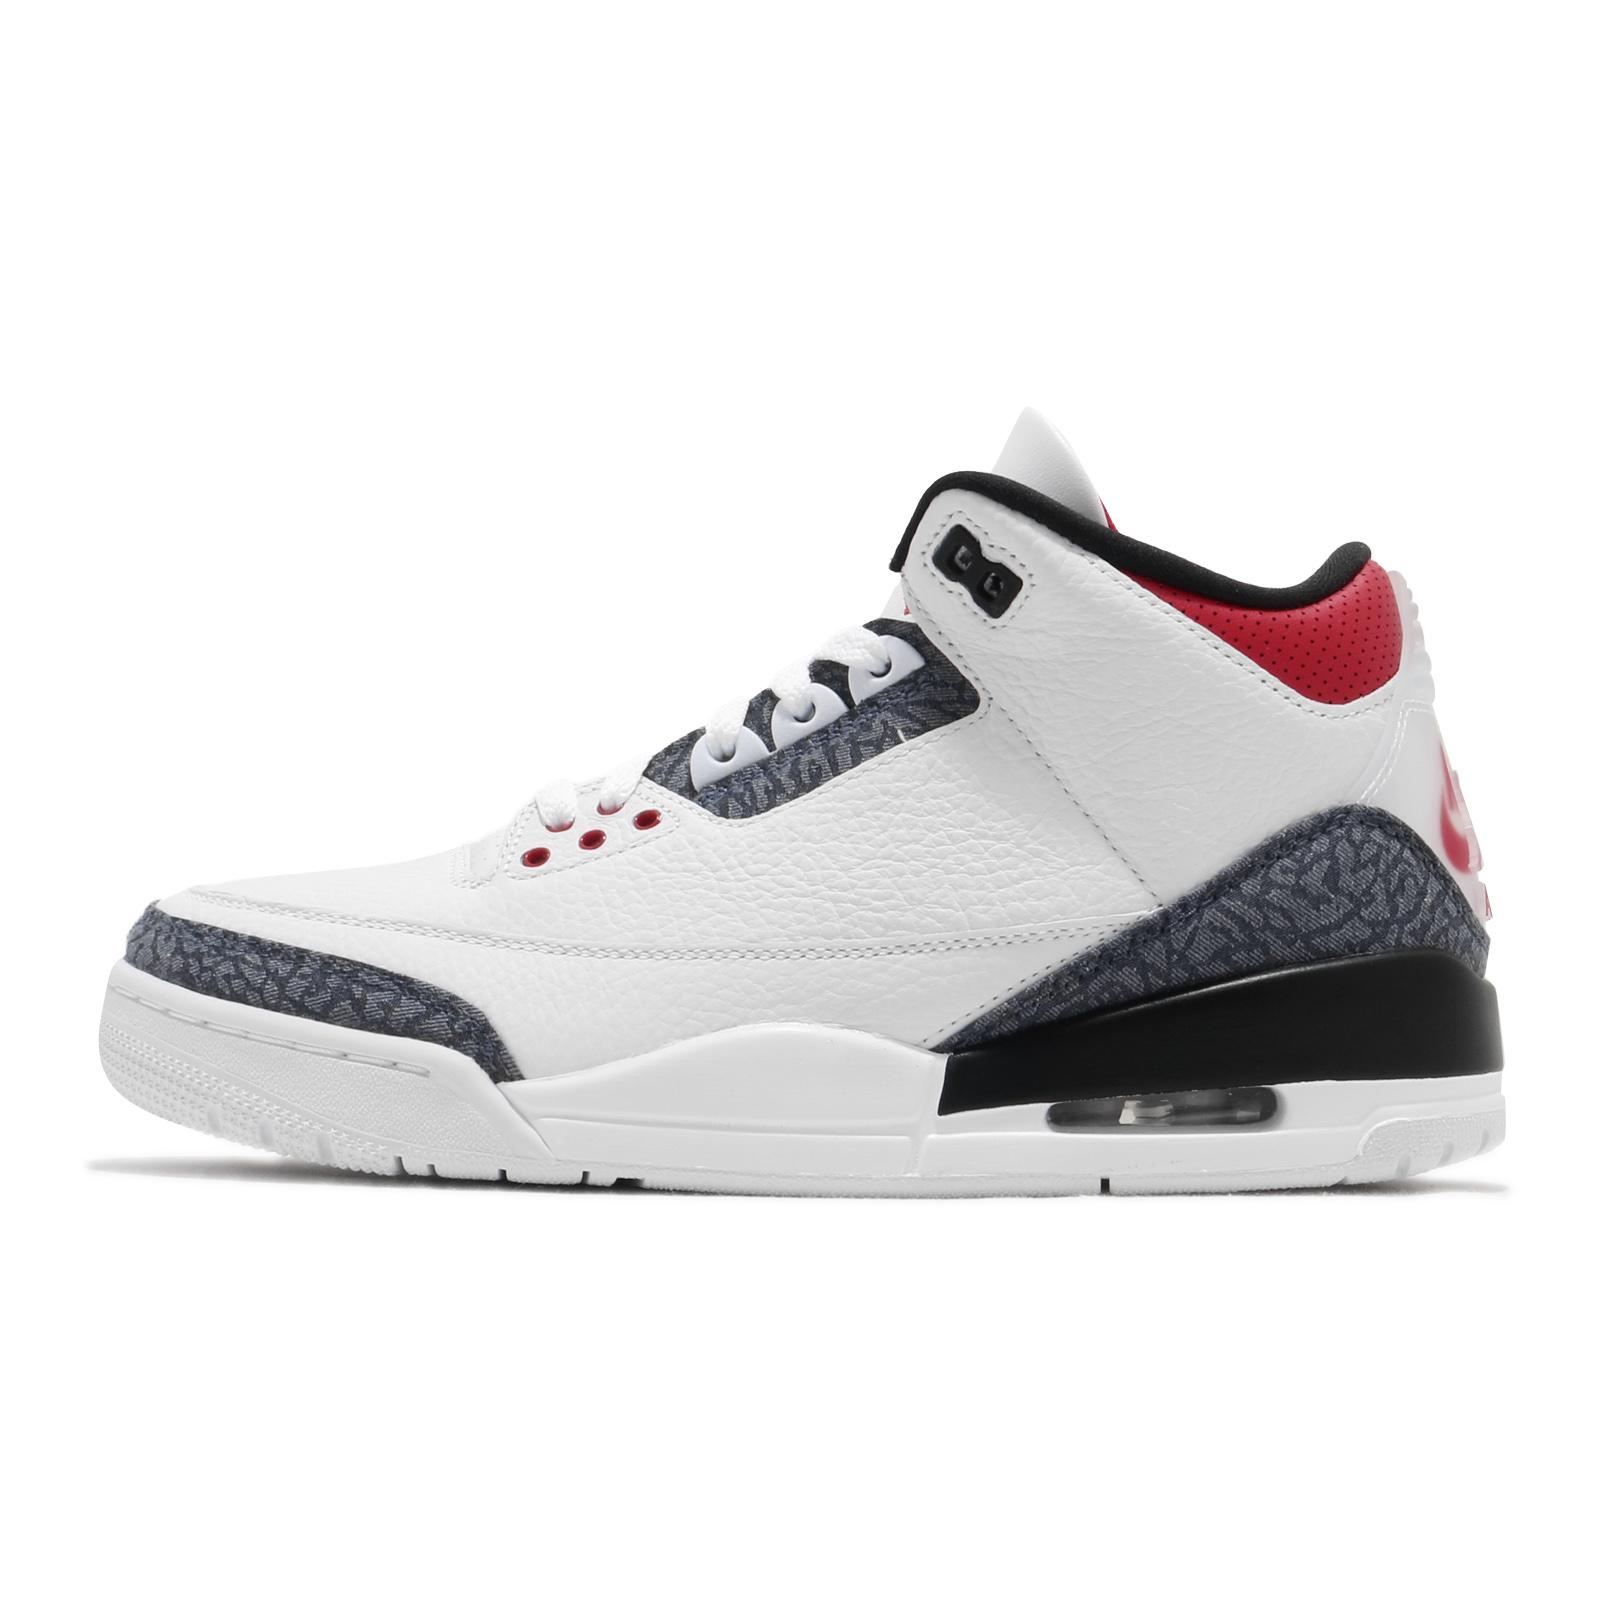 Nike Air Jordan 3 Retro SE Denim Fire Red 白 灰 紅 III 3代 【ACS】